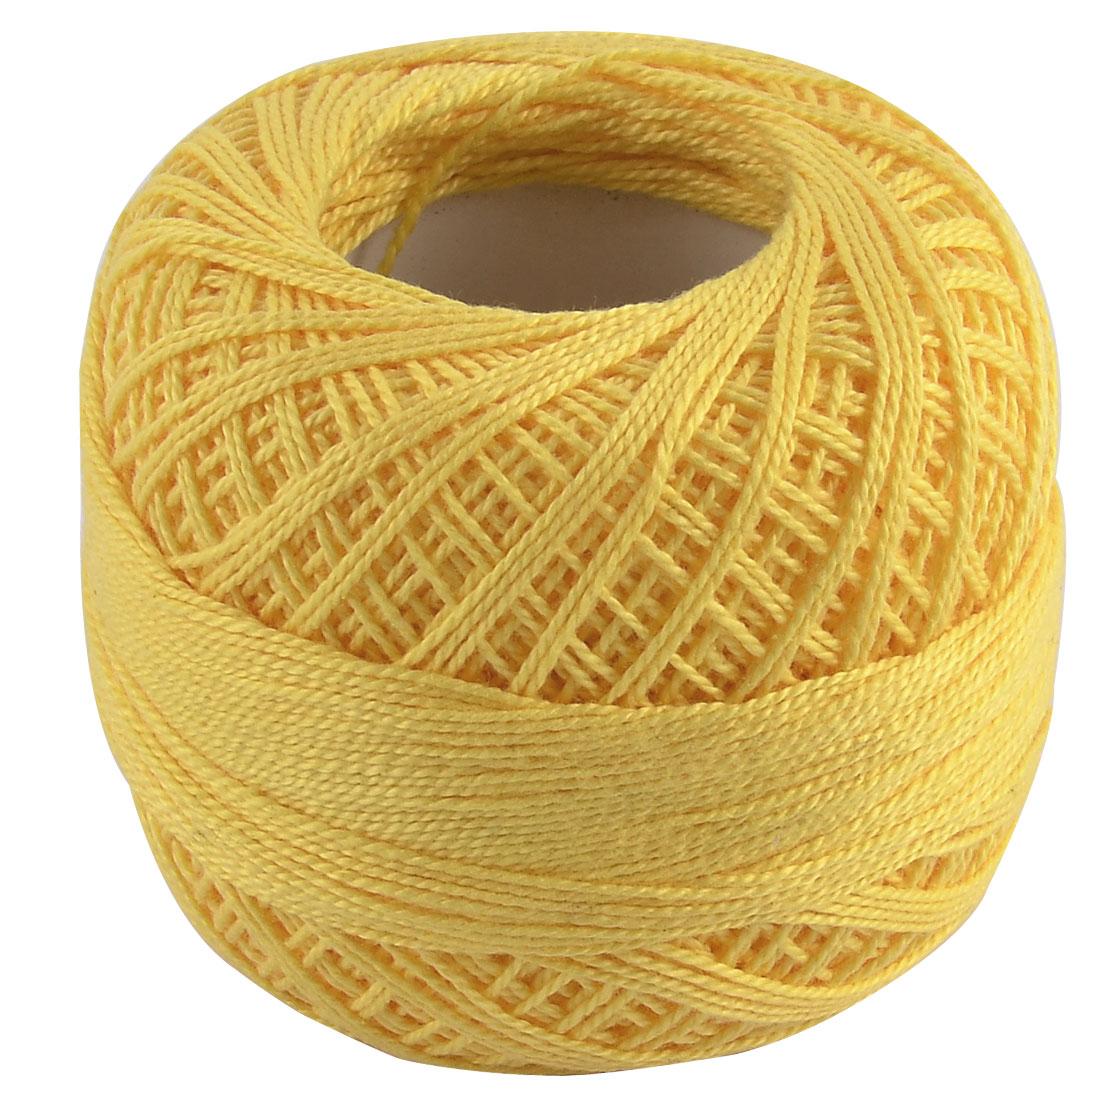 Cotton Handcraft Hand Knitting Crochet DIY Sock Coaster Shawl Yarn Yellow